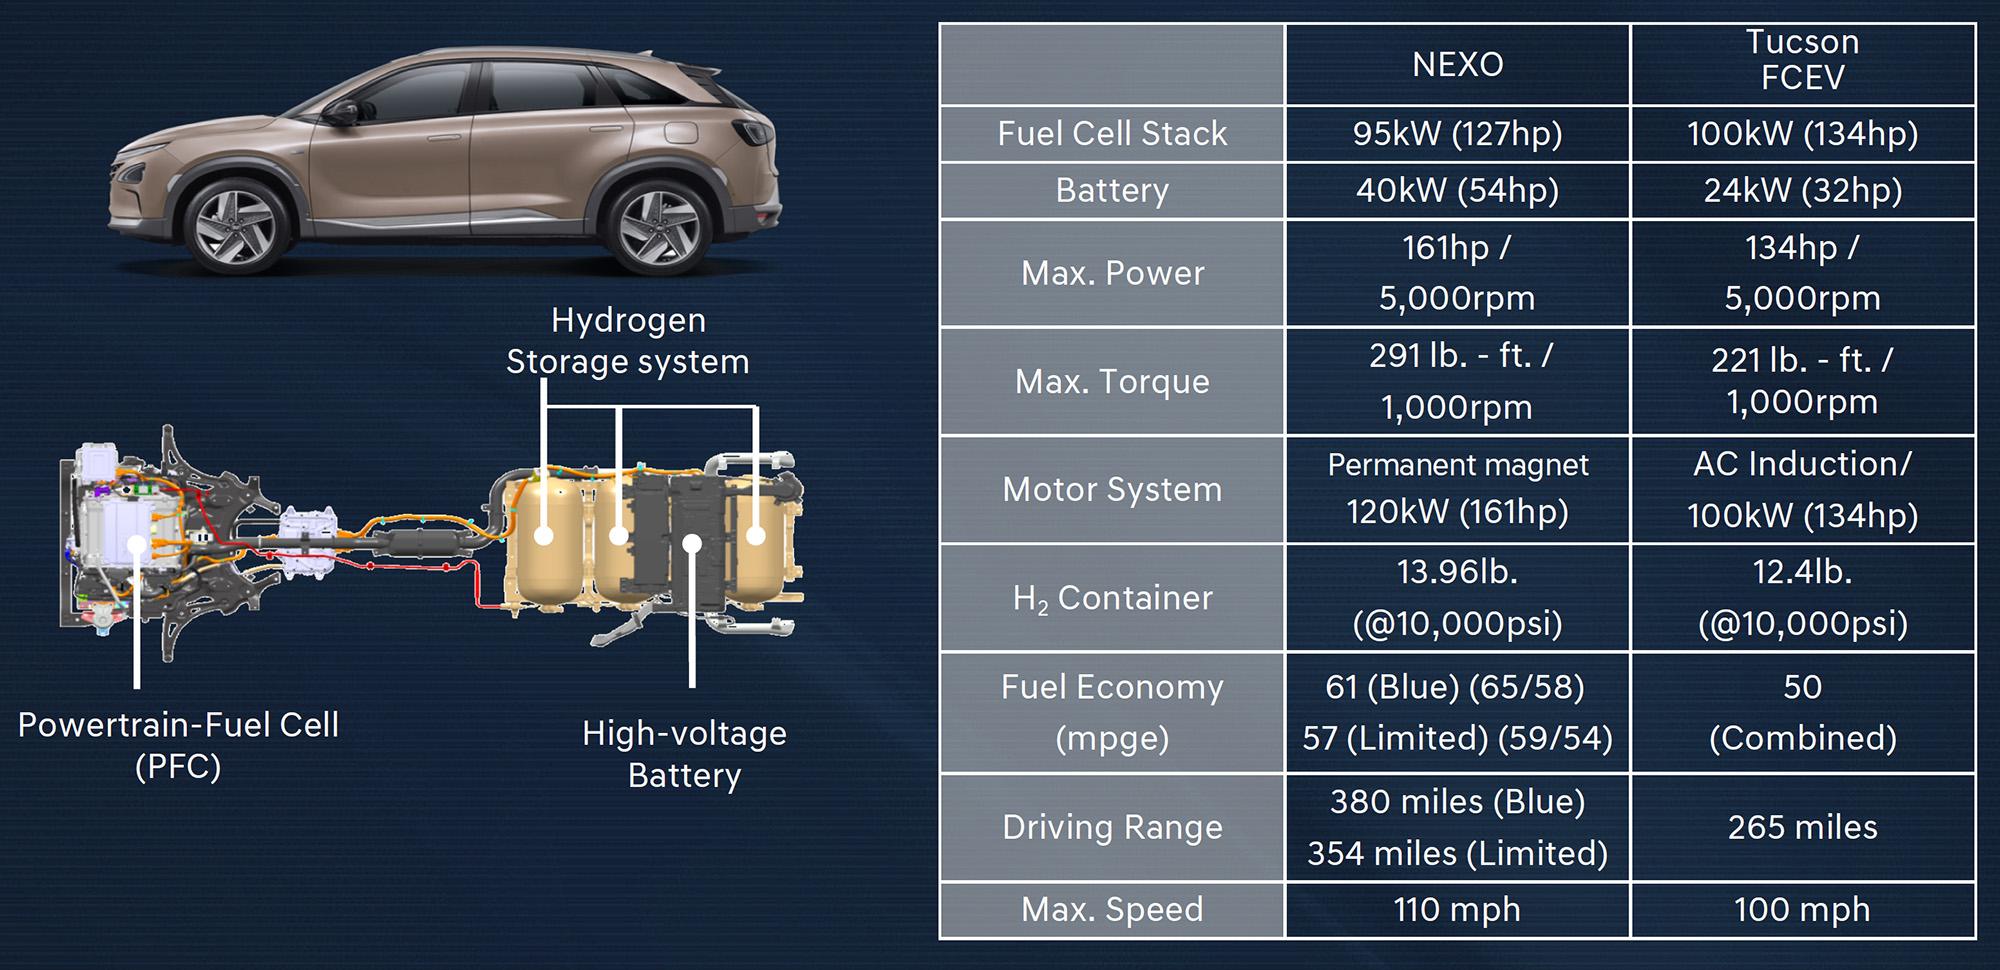 2019 Hyundai Nexo fuel-cell launch